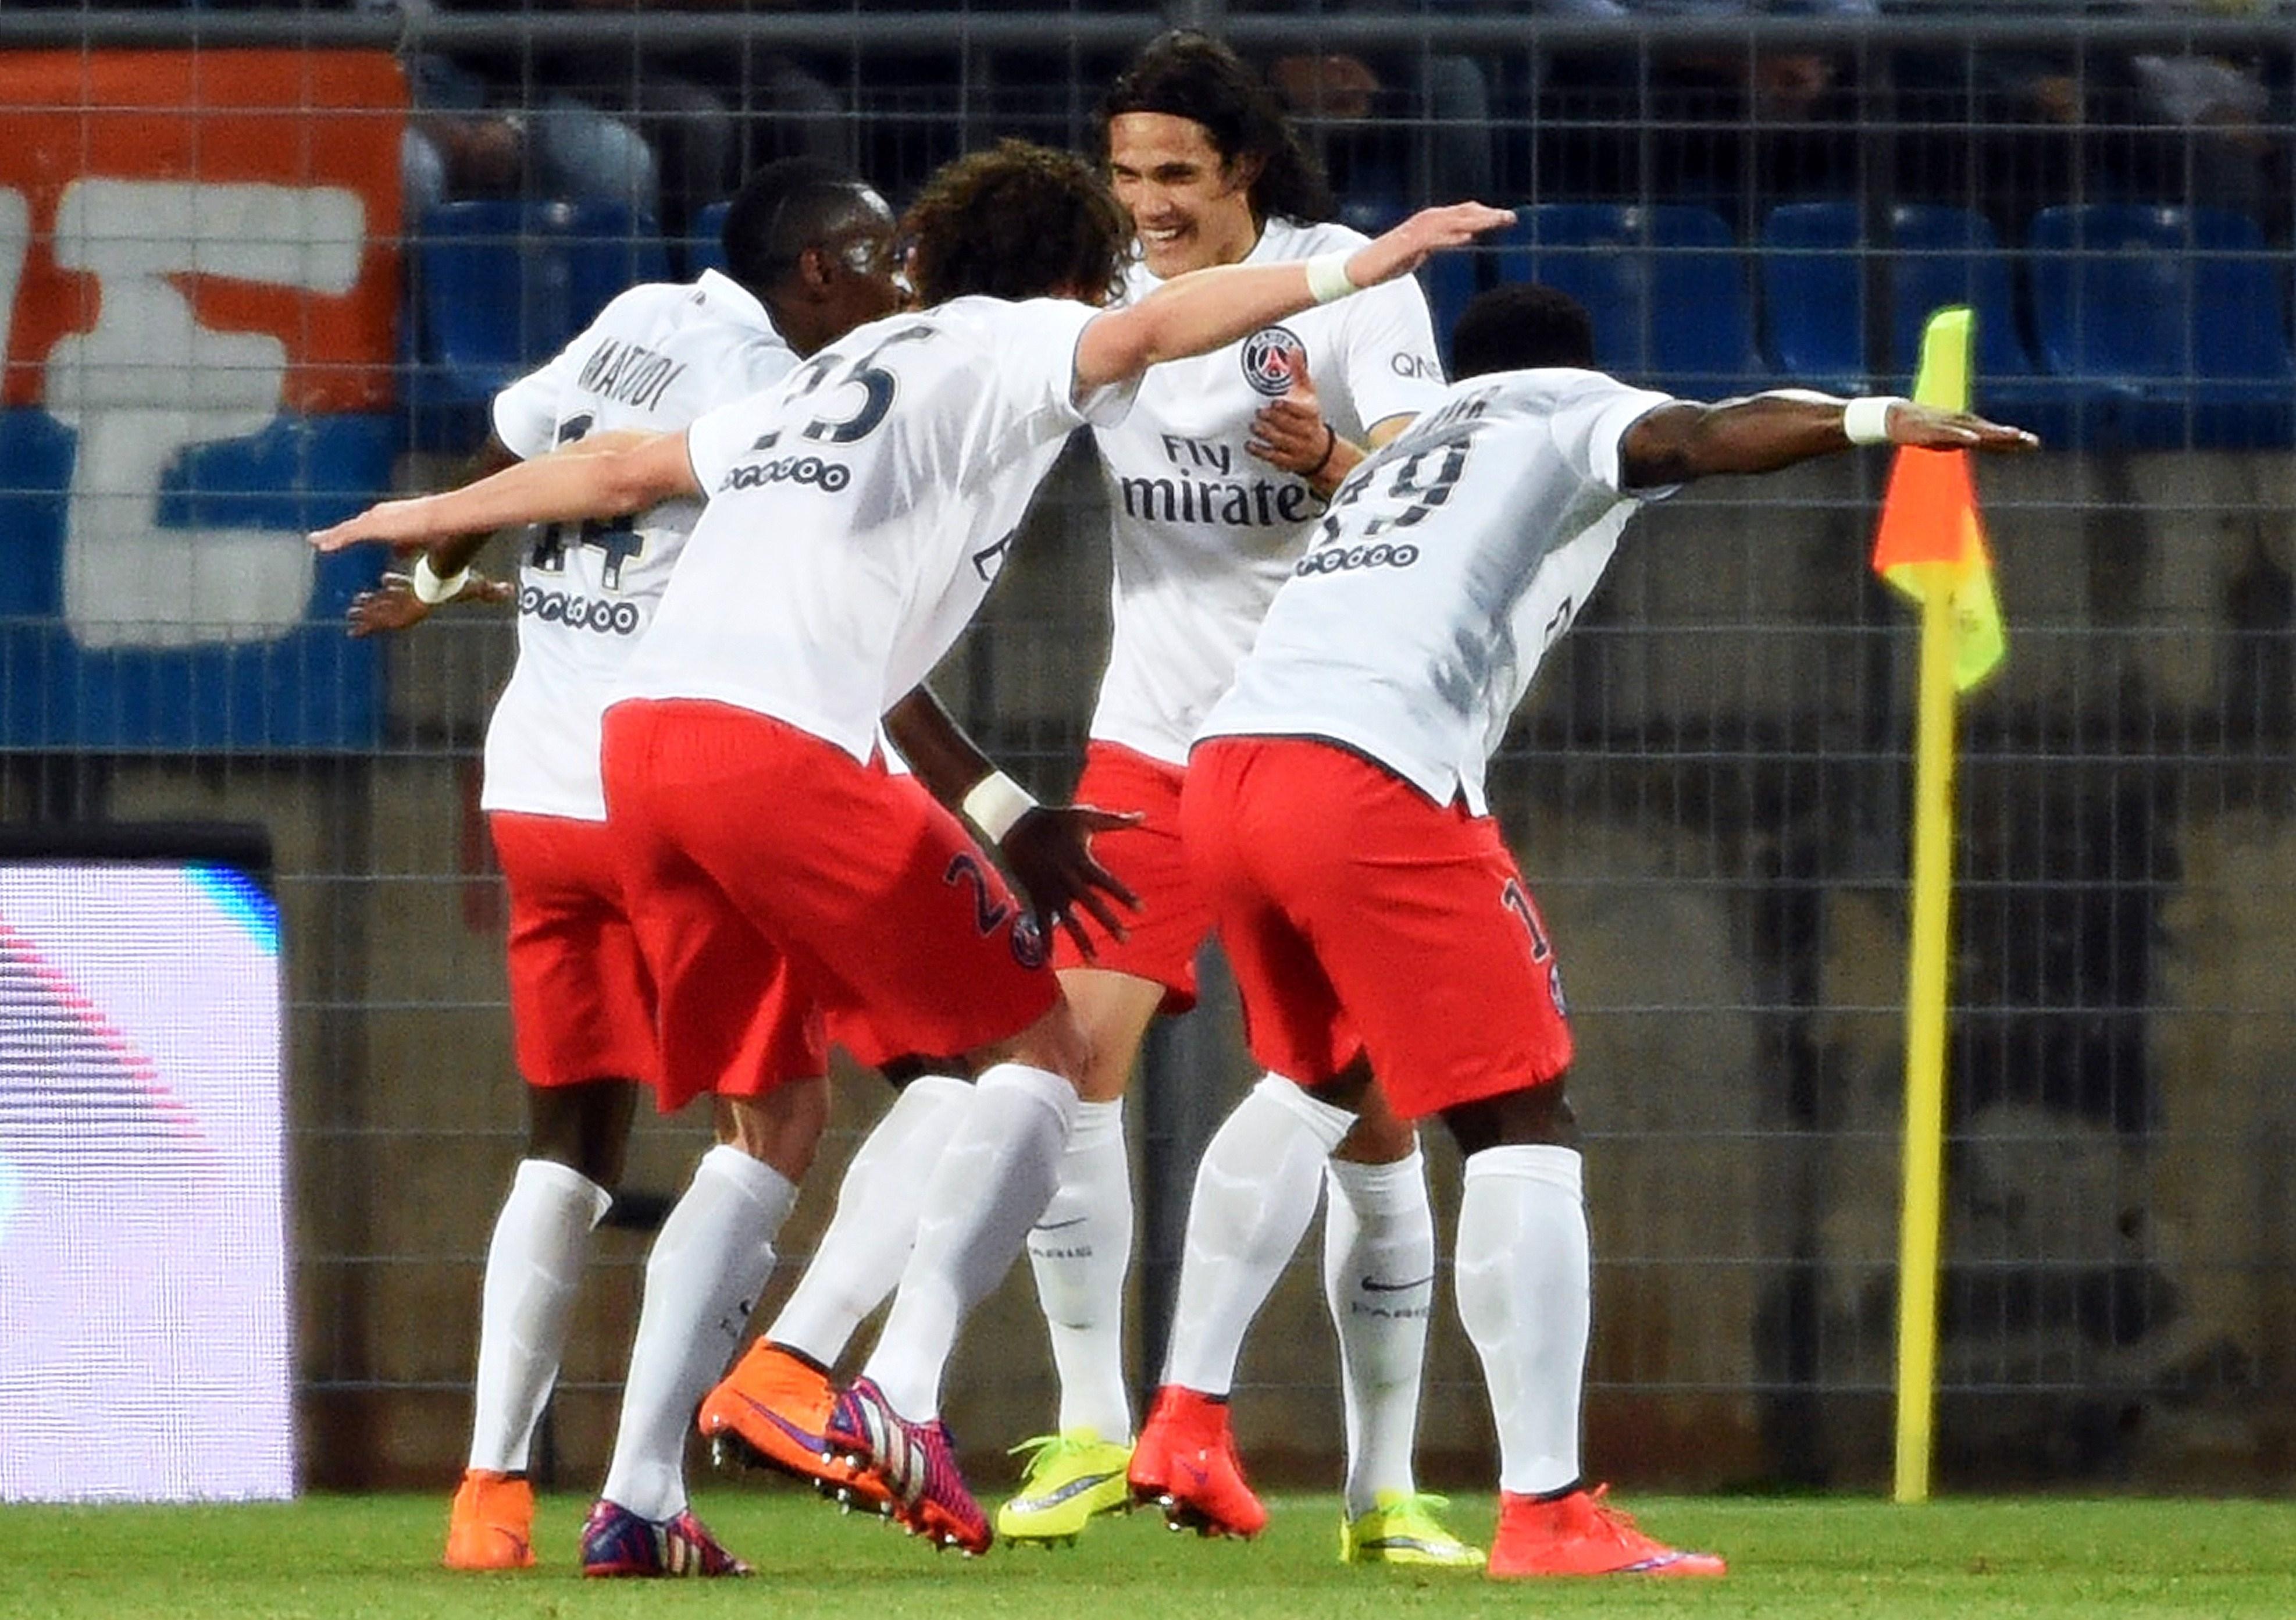 Image Result For Vivo Lyon Vs Angers En Vivo Champions League